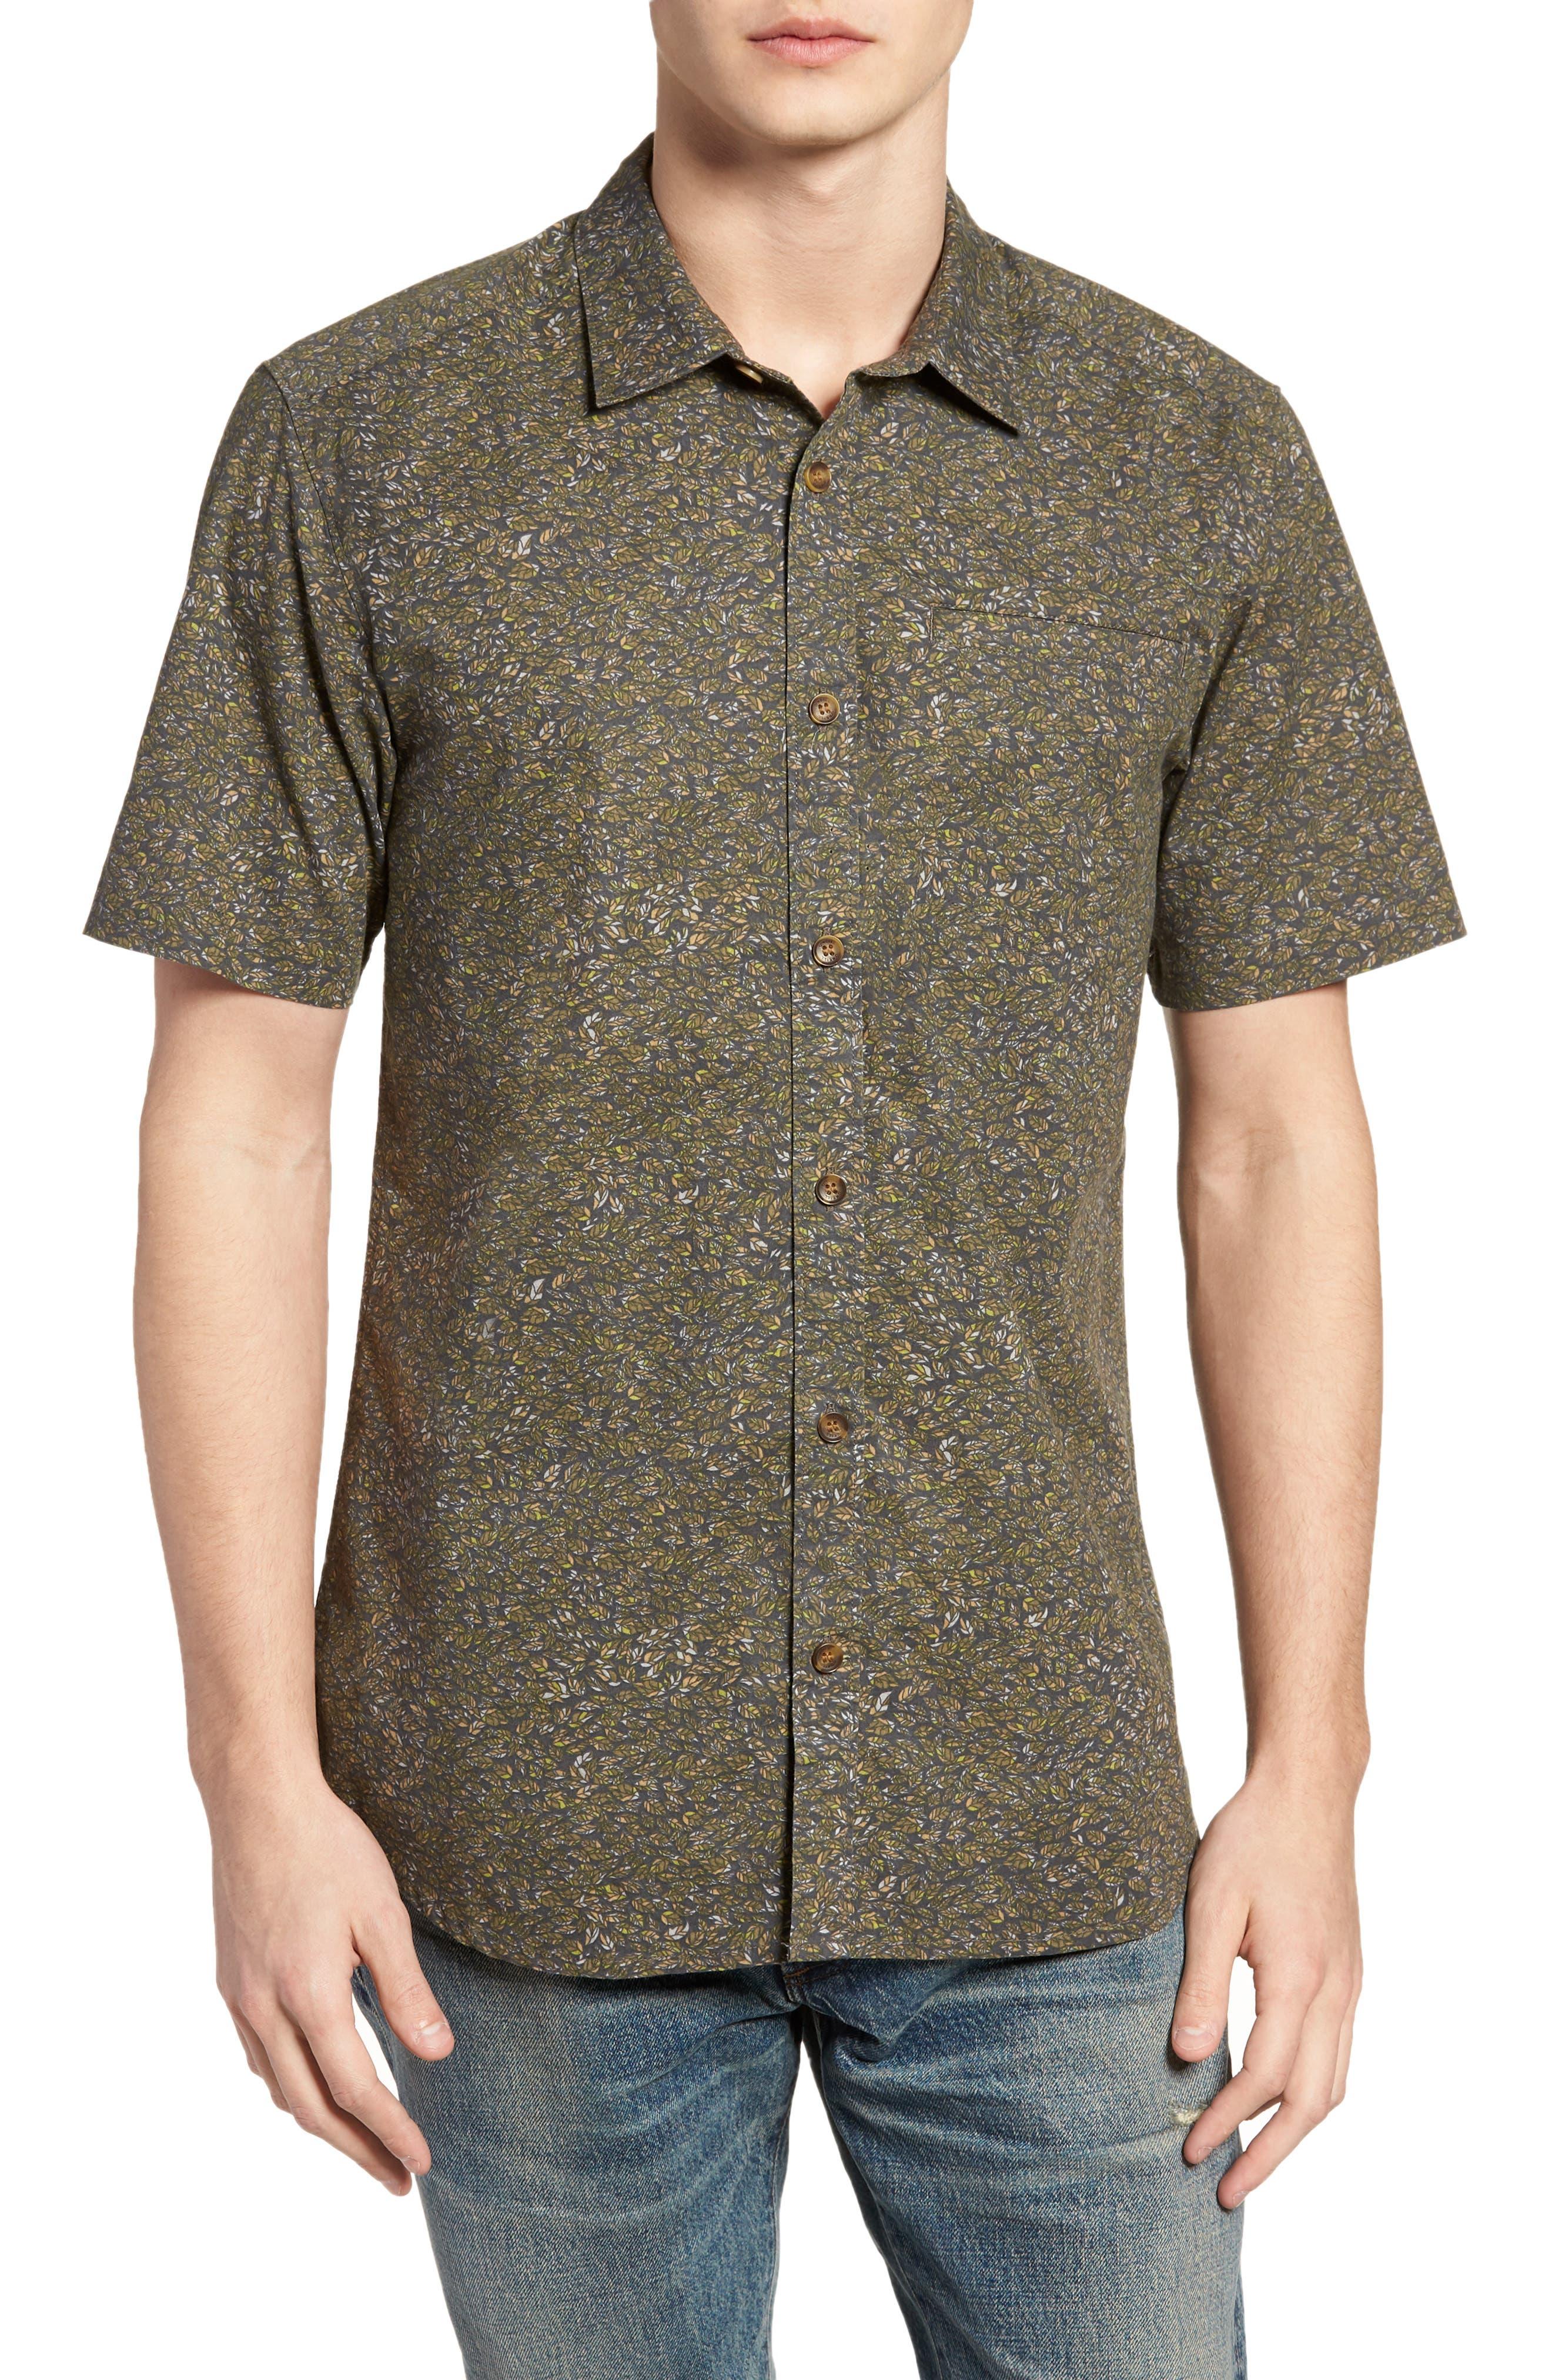 Livingston Short Sleeve Shirt,                             Main thumbnail 1, color,                             Asphalt